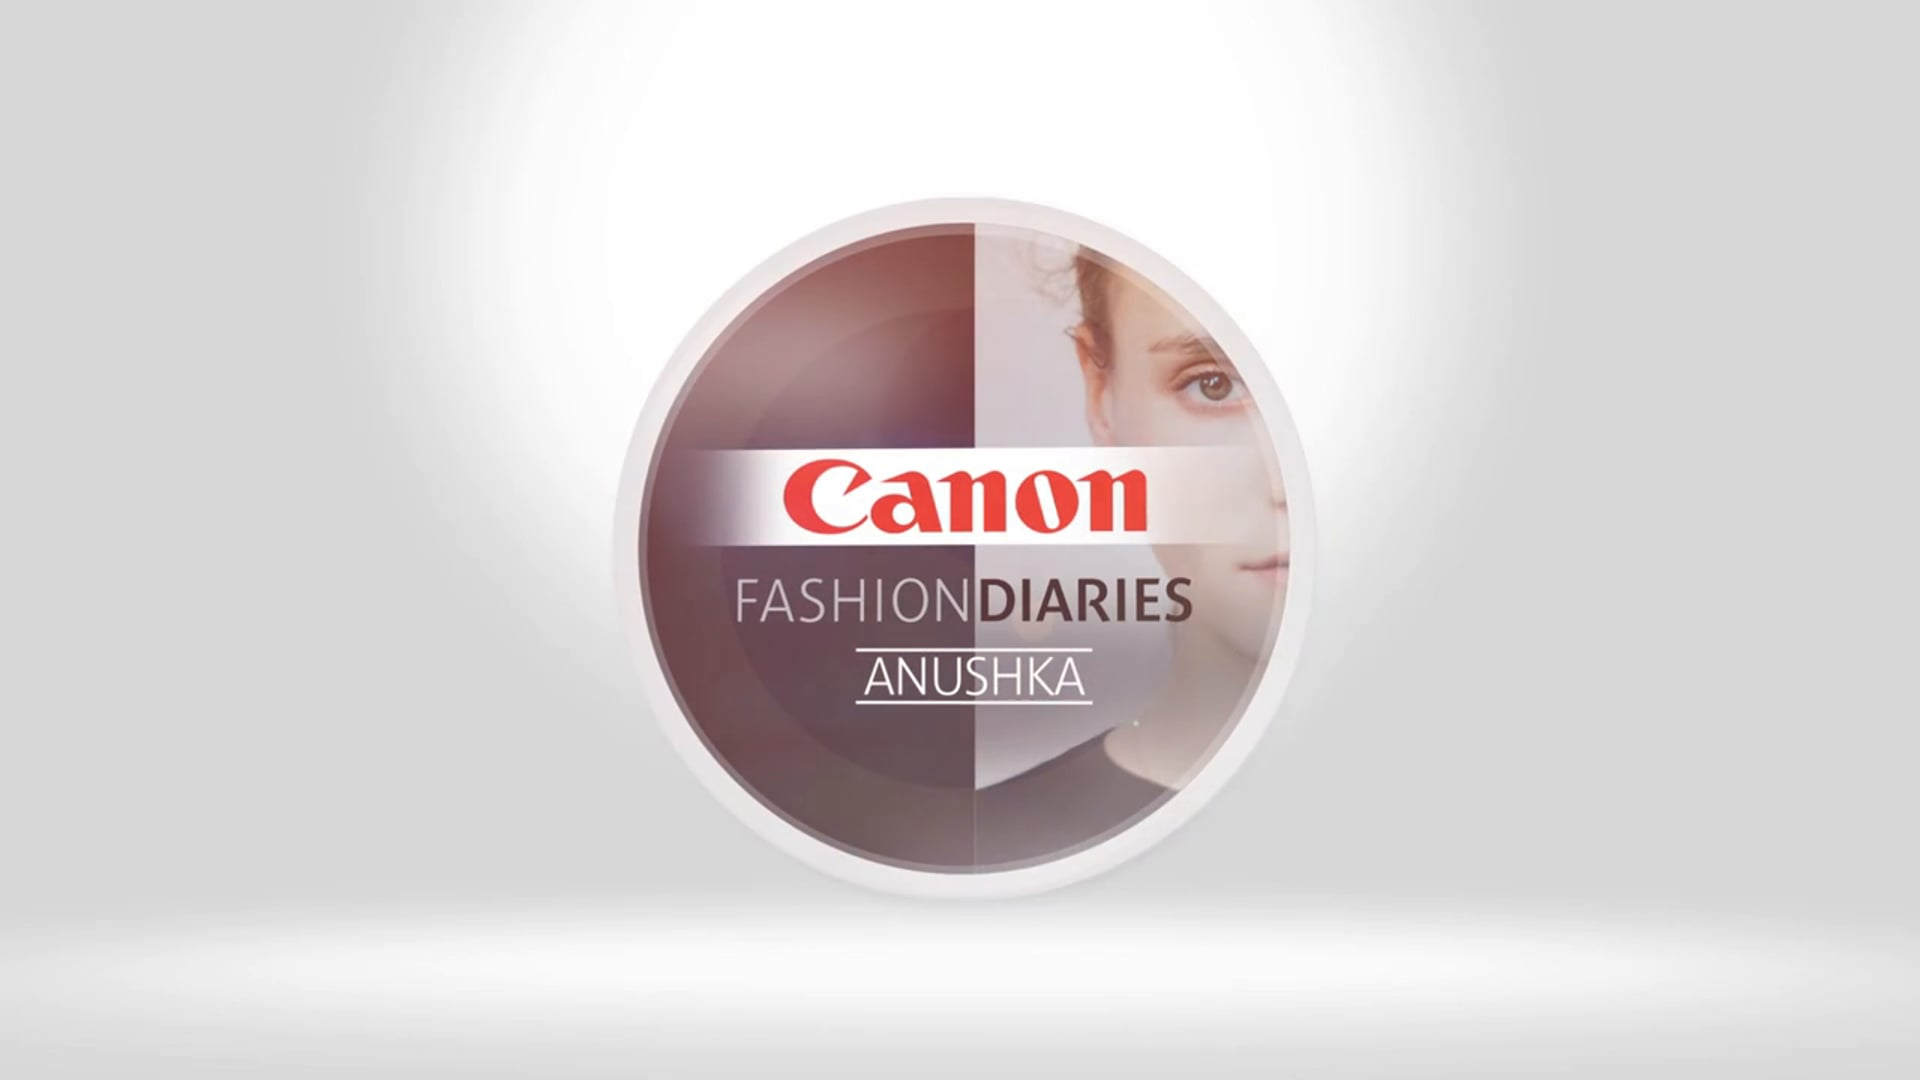 Canon Fashion Diaries - Anushka